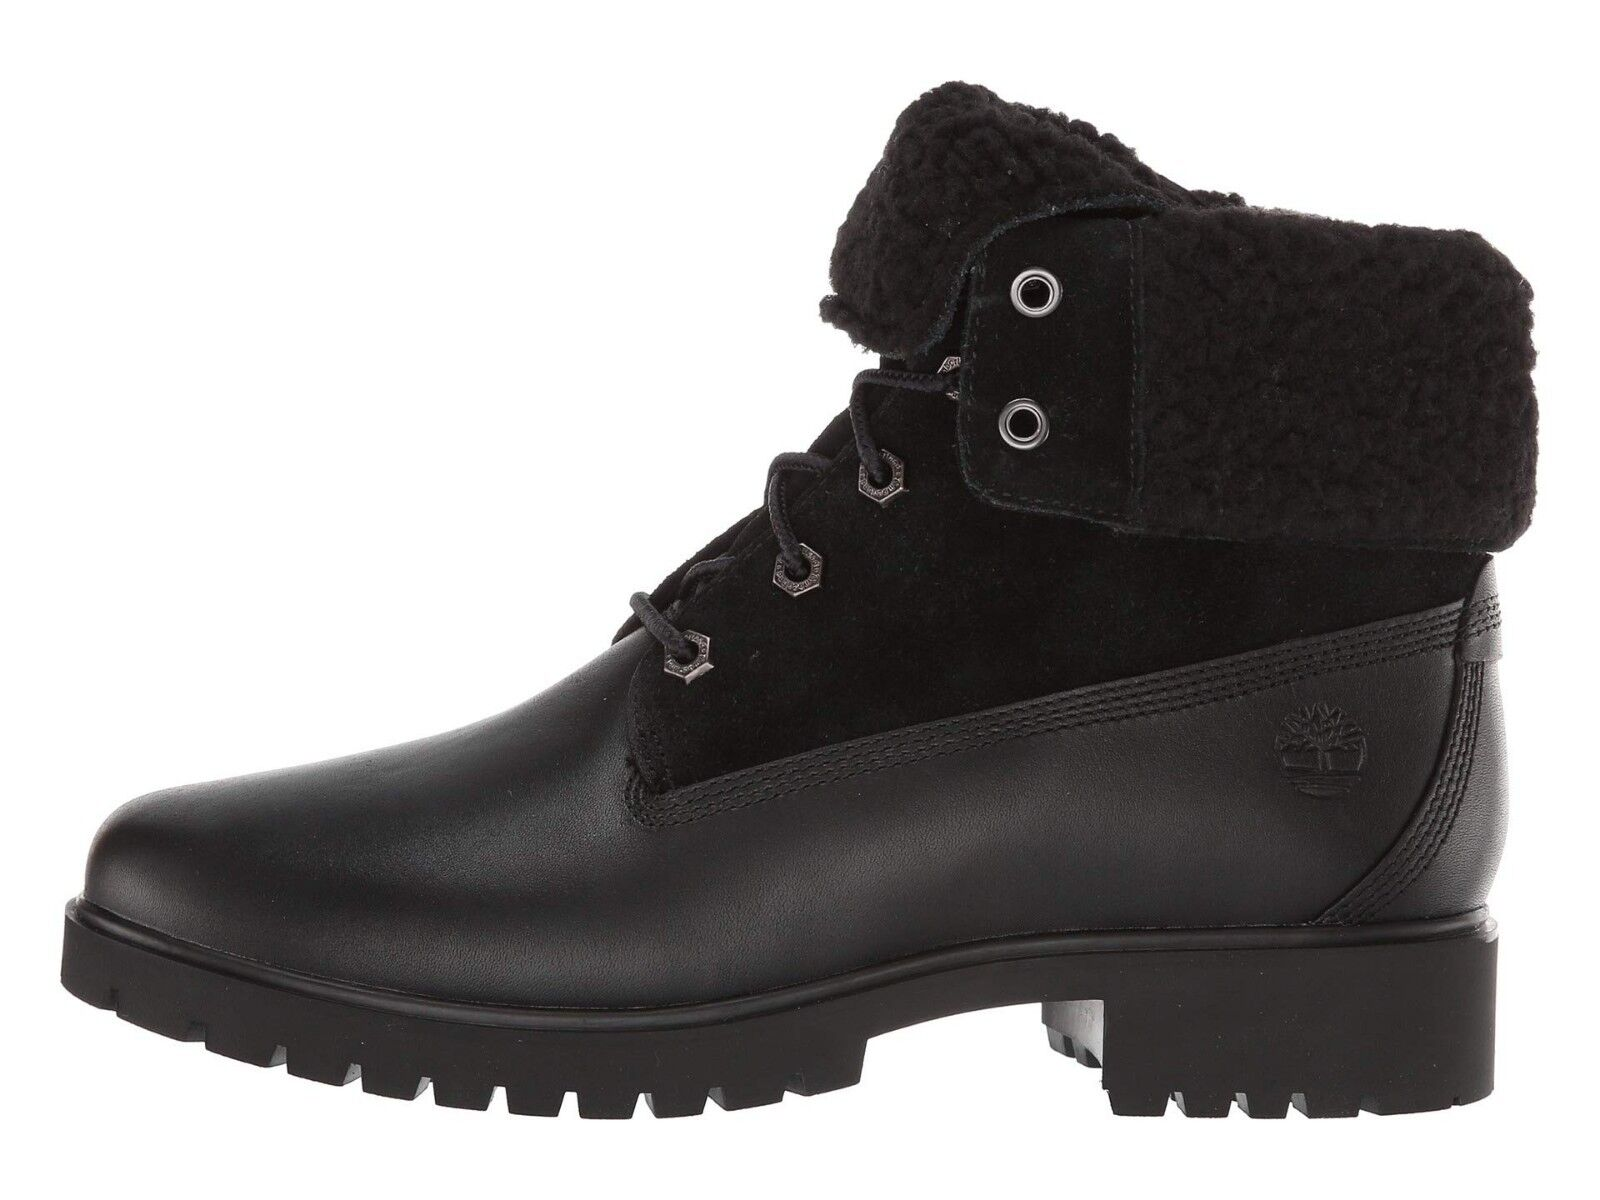 Women's Shoes Timberland JAYNE TEDDY FLEECE Fold-Down WP Boots A1SGK BLACK 1